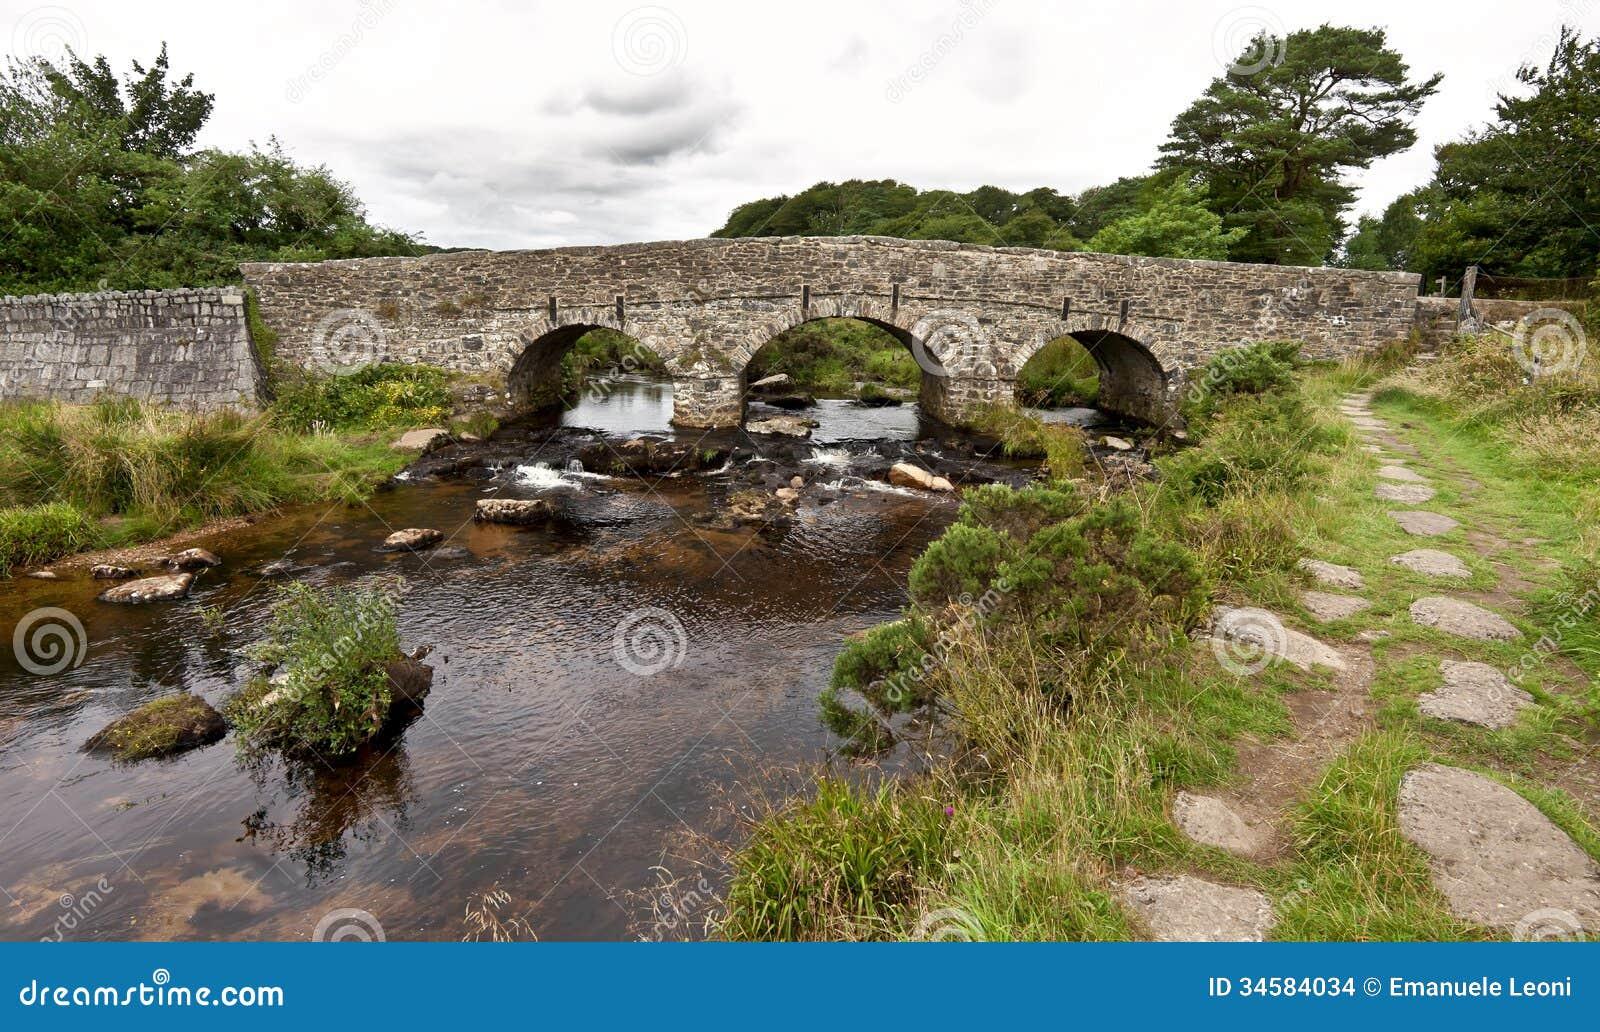 Postbridge United Kingdom  City pictures : ... bridge at Postbridge on Dartmoor in Devon, England, United Kingdom